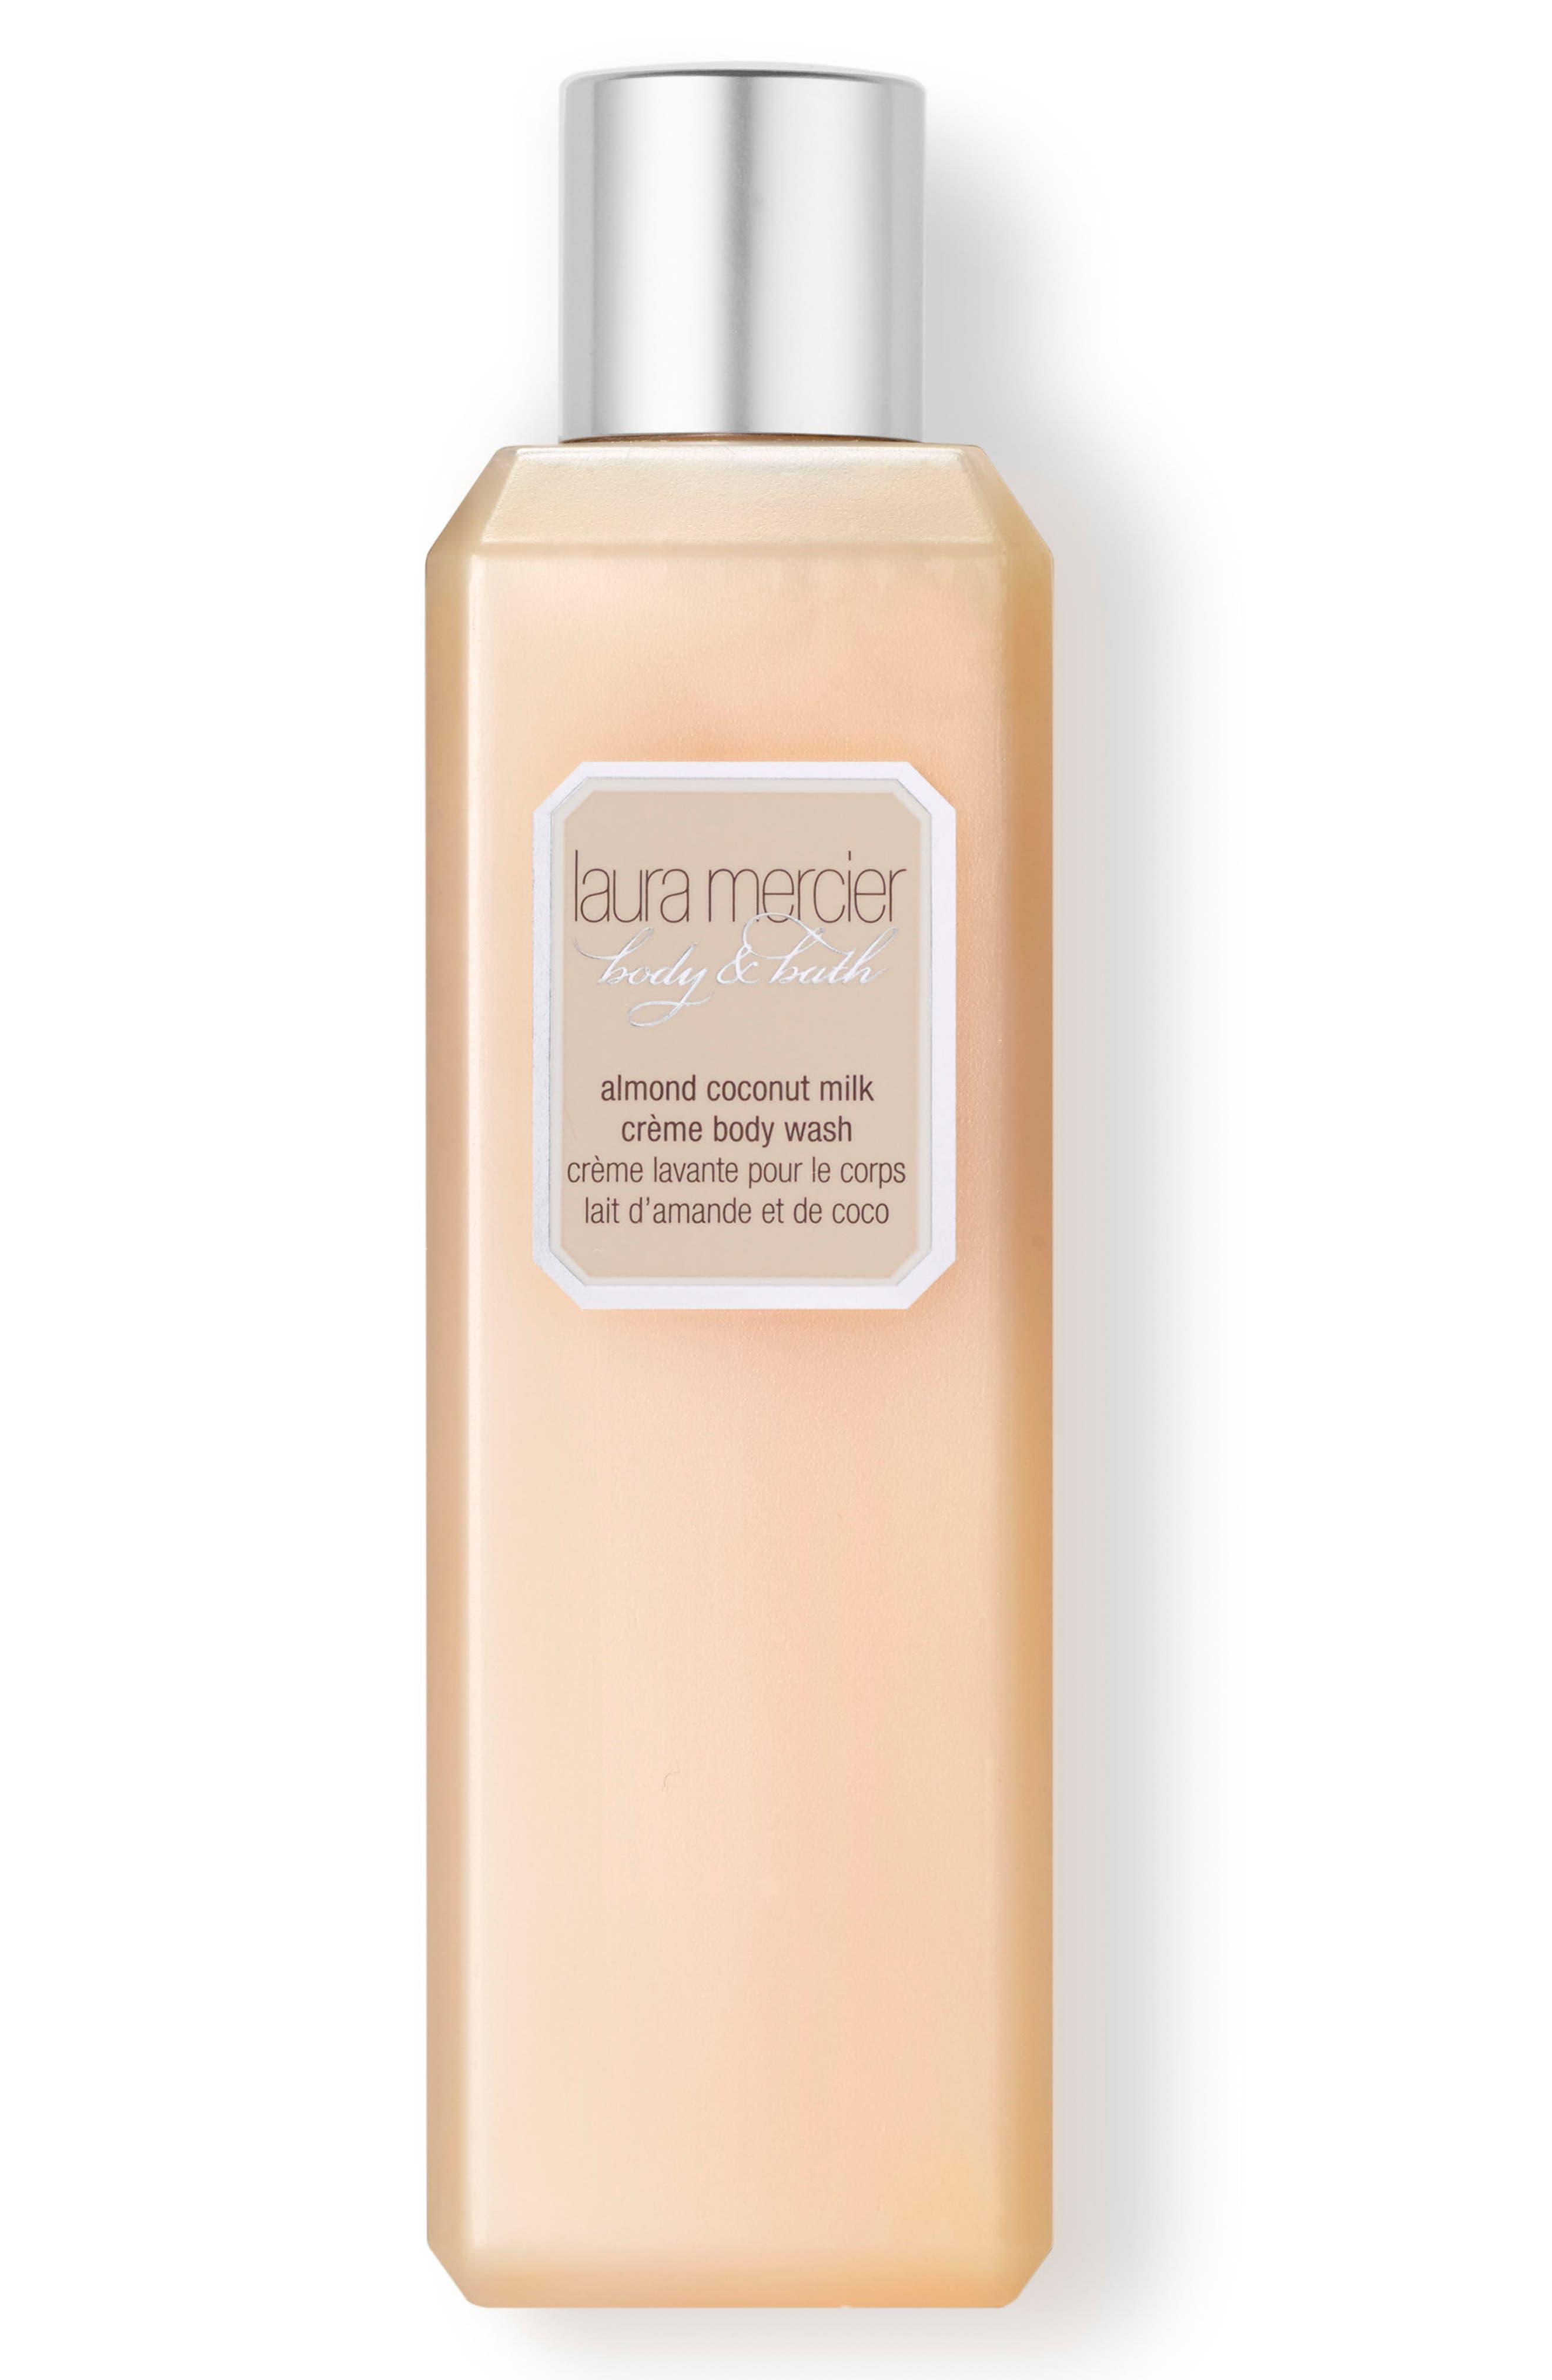 Alternate Image 1 Selected - Laura Mercier 'Almond Coconut Milk' Crème Body Wash